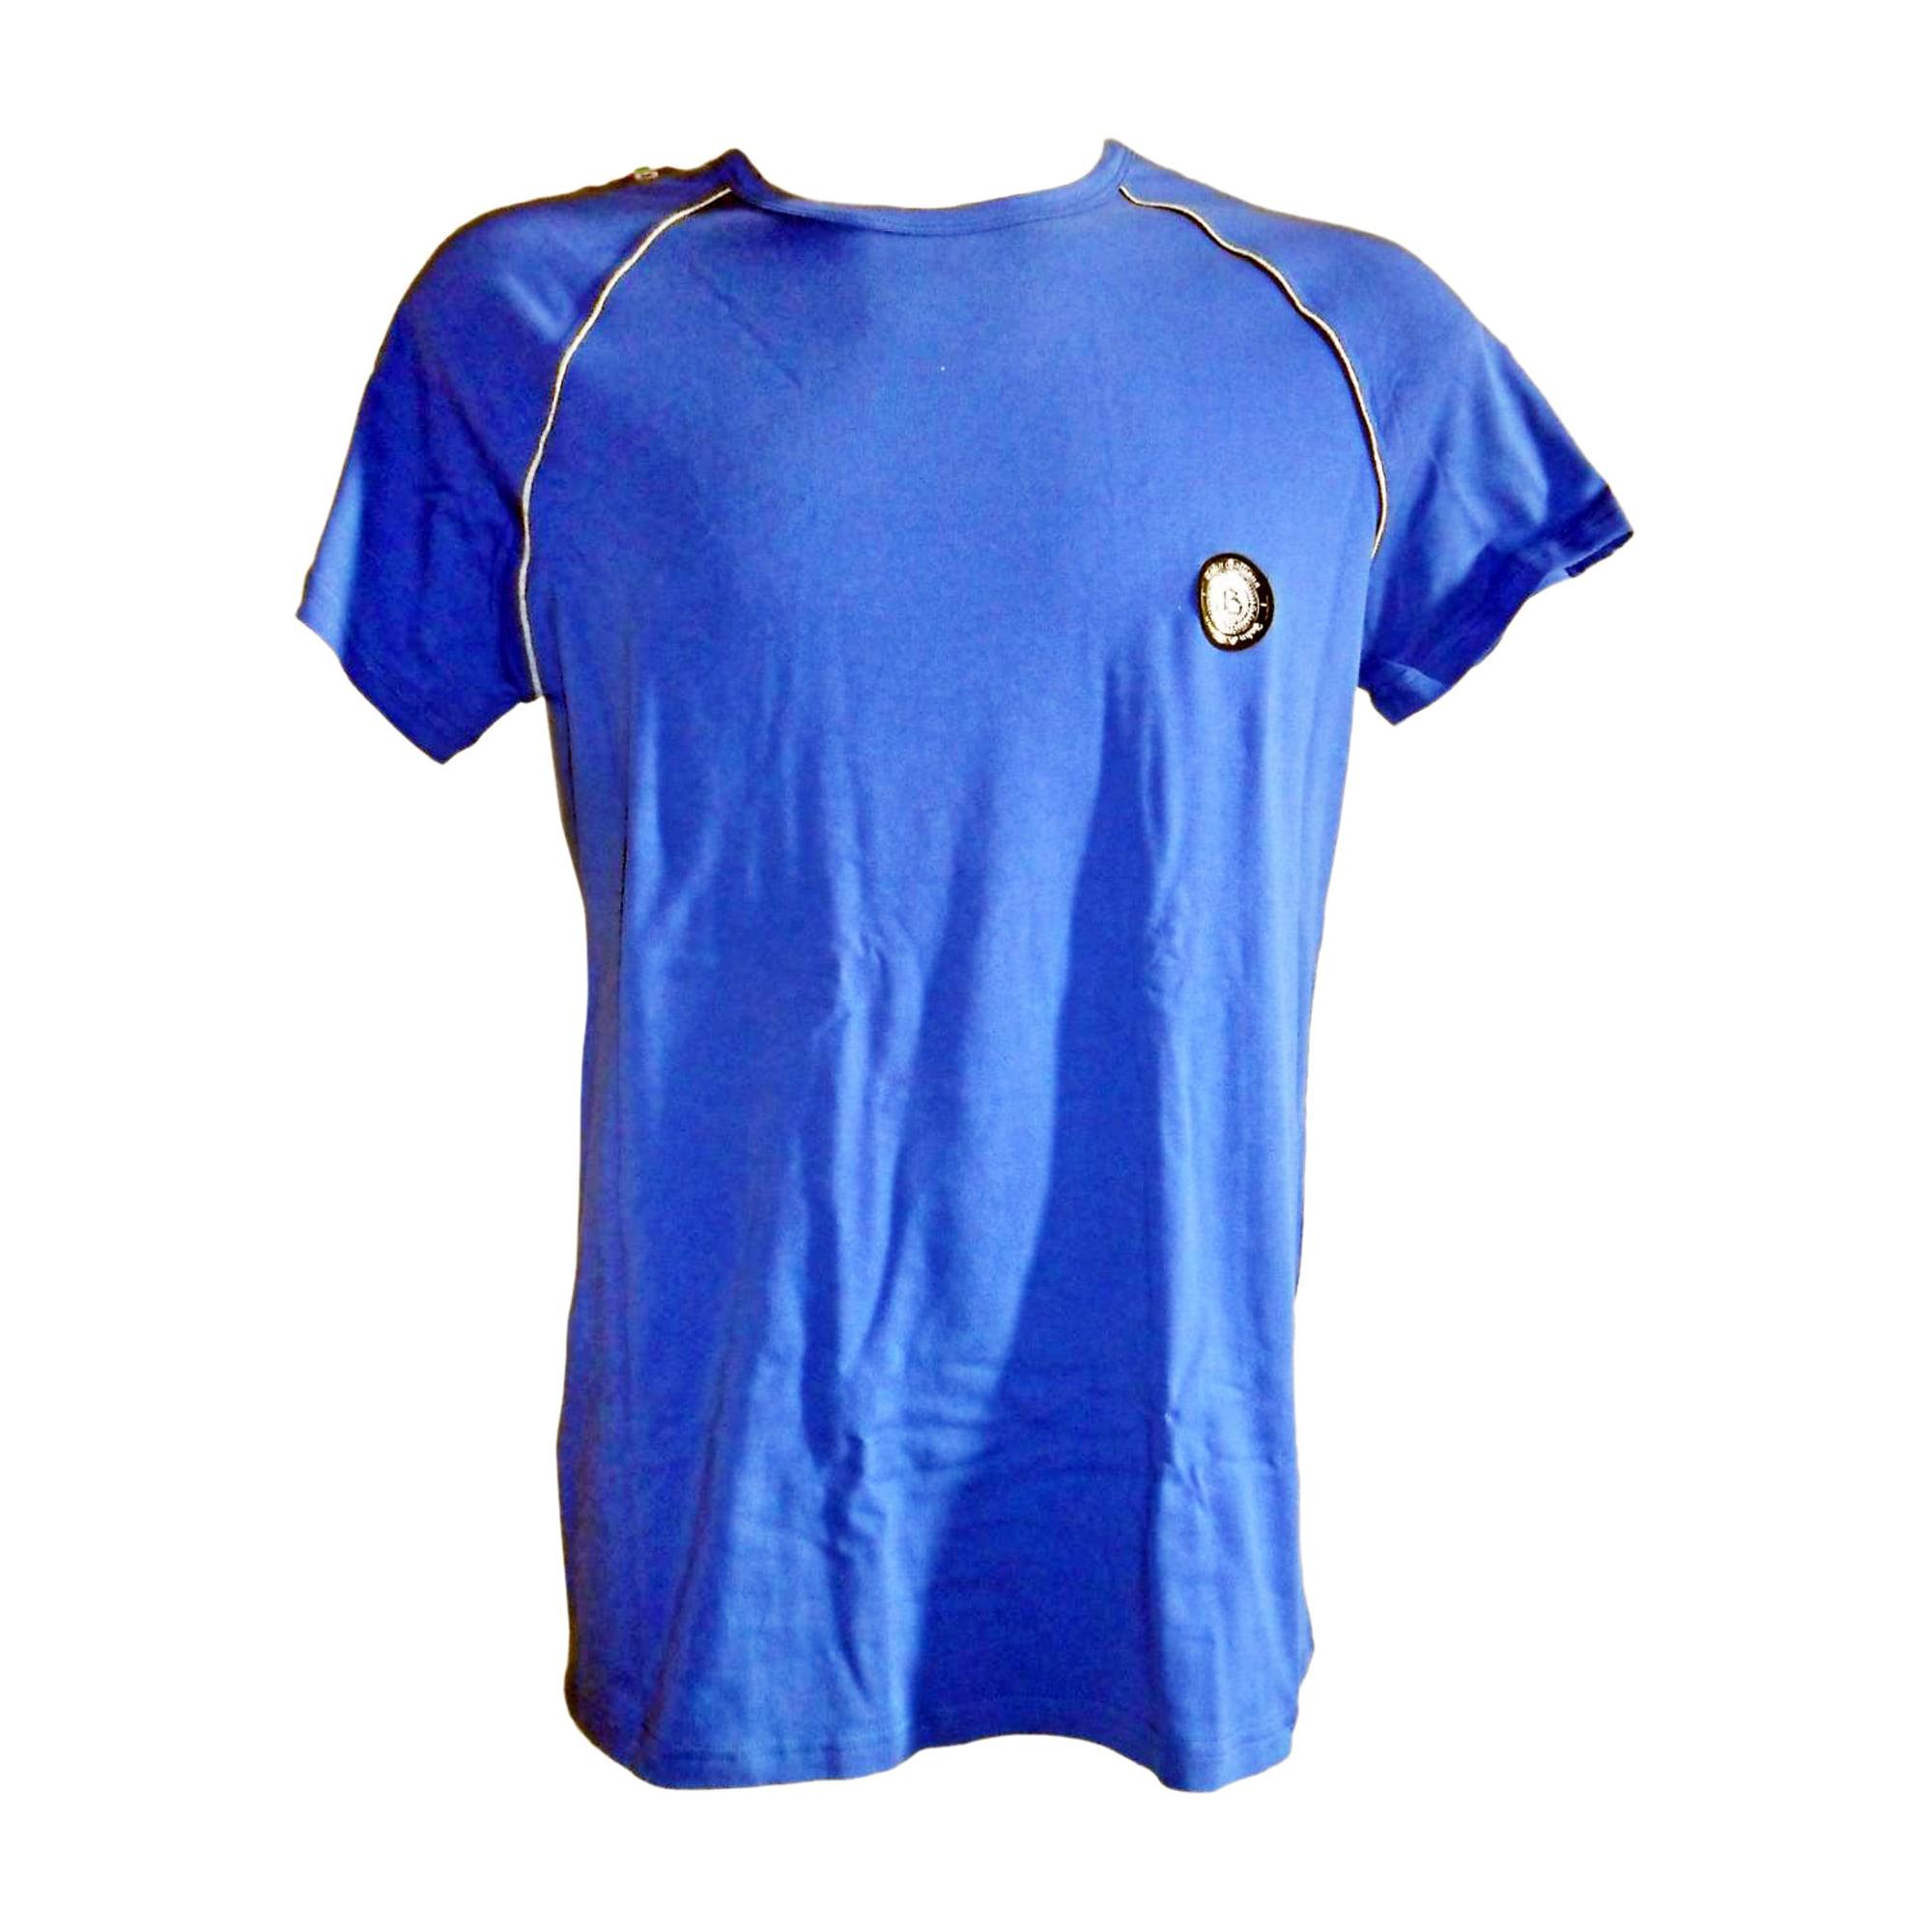 Tee-shirt JOHN GALLIANO Bleu, bleu marine, bleu turquoise